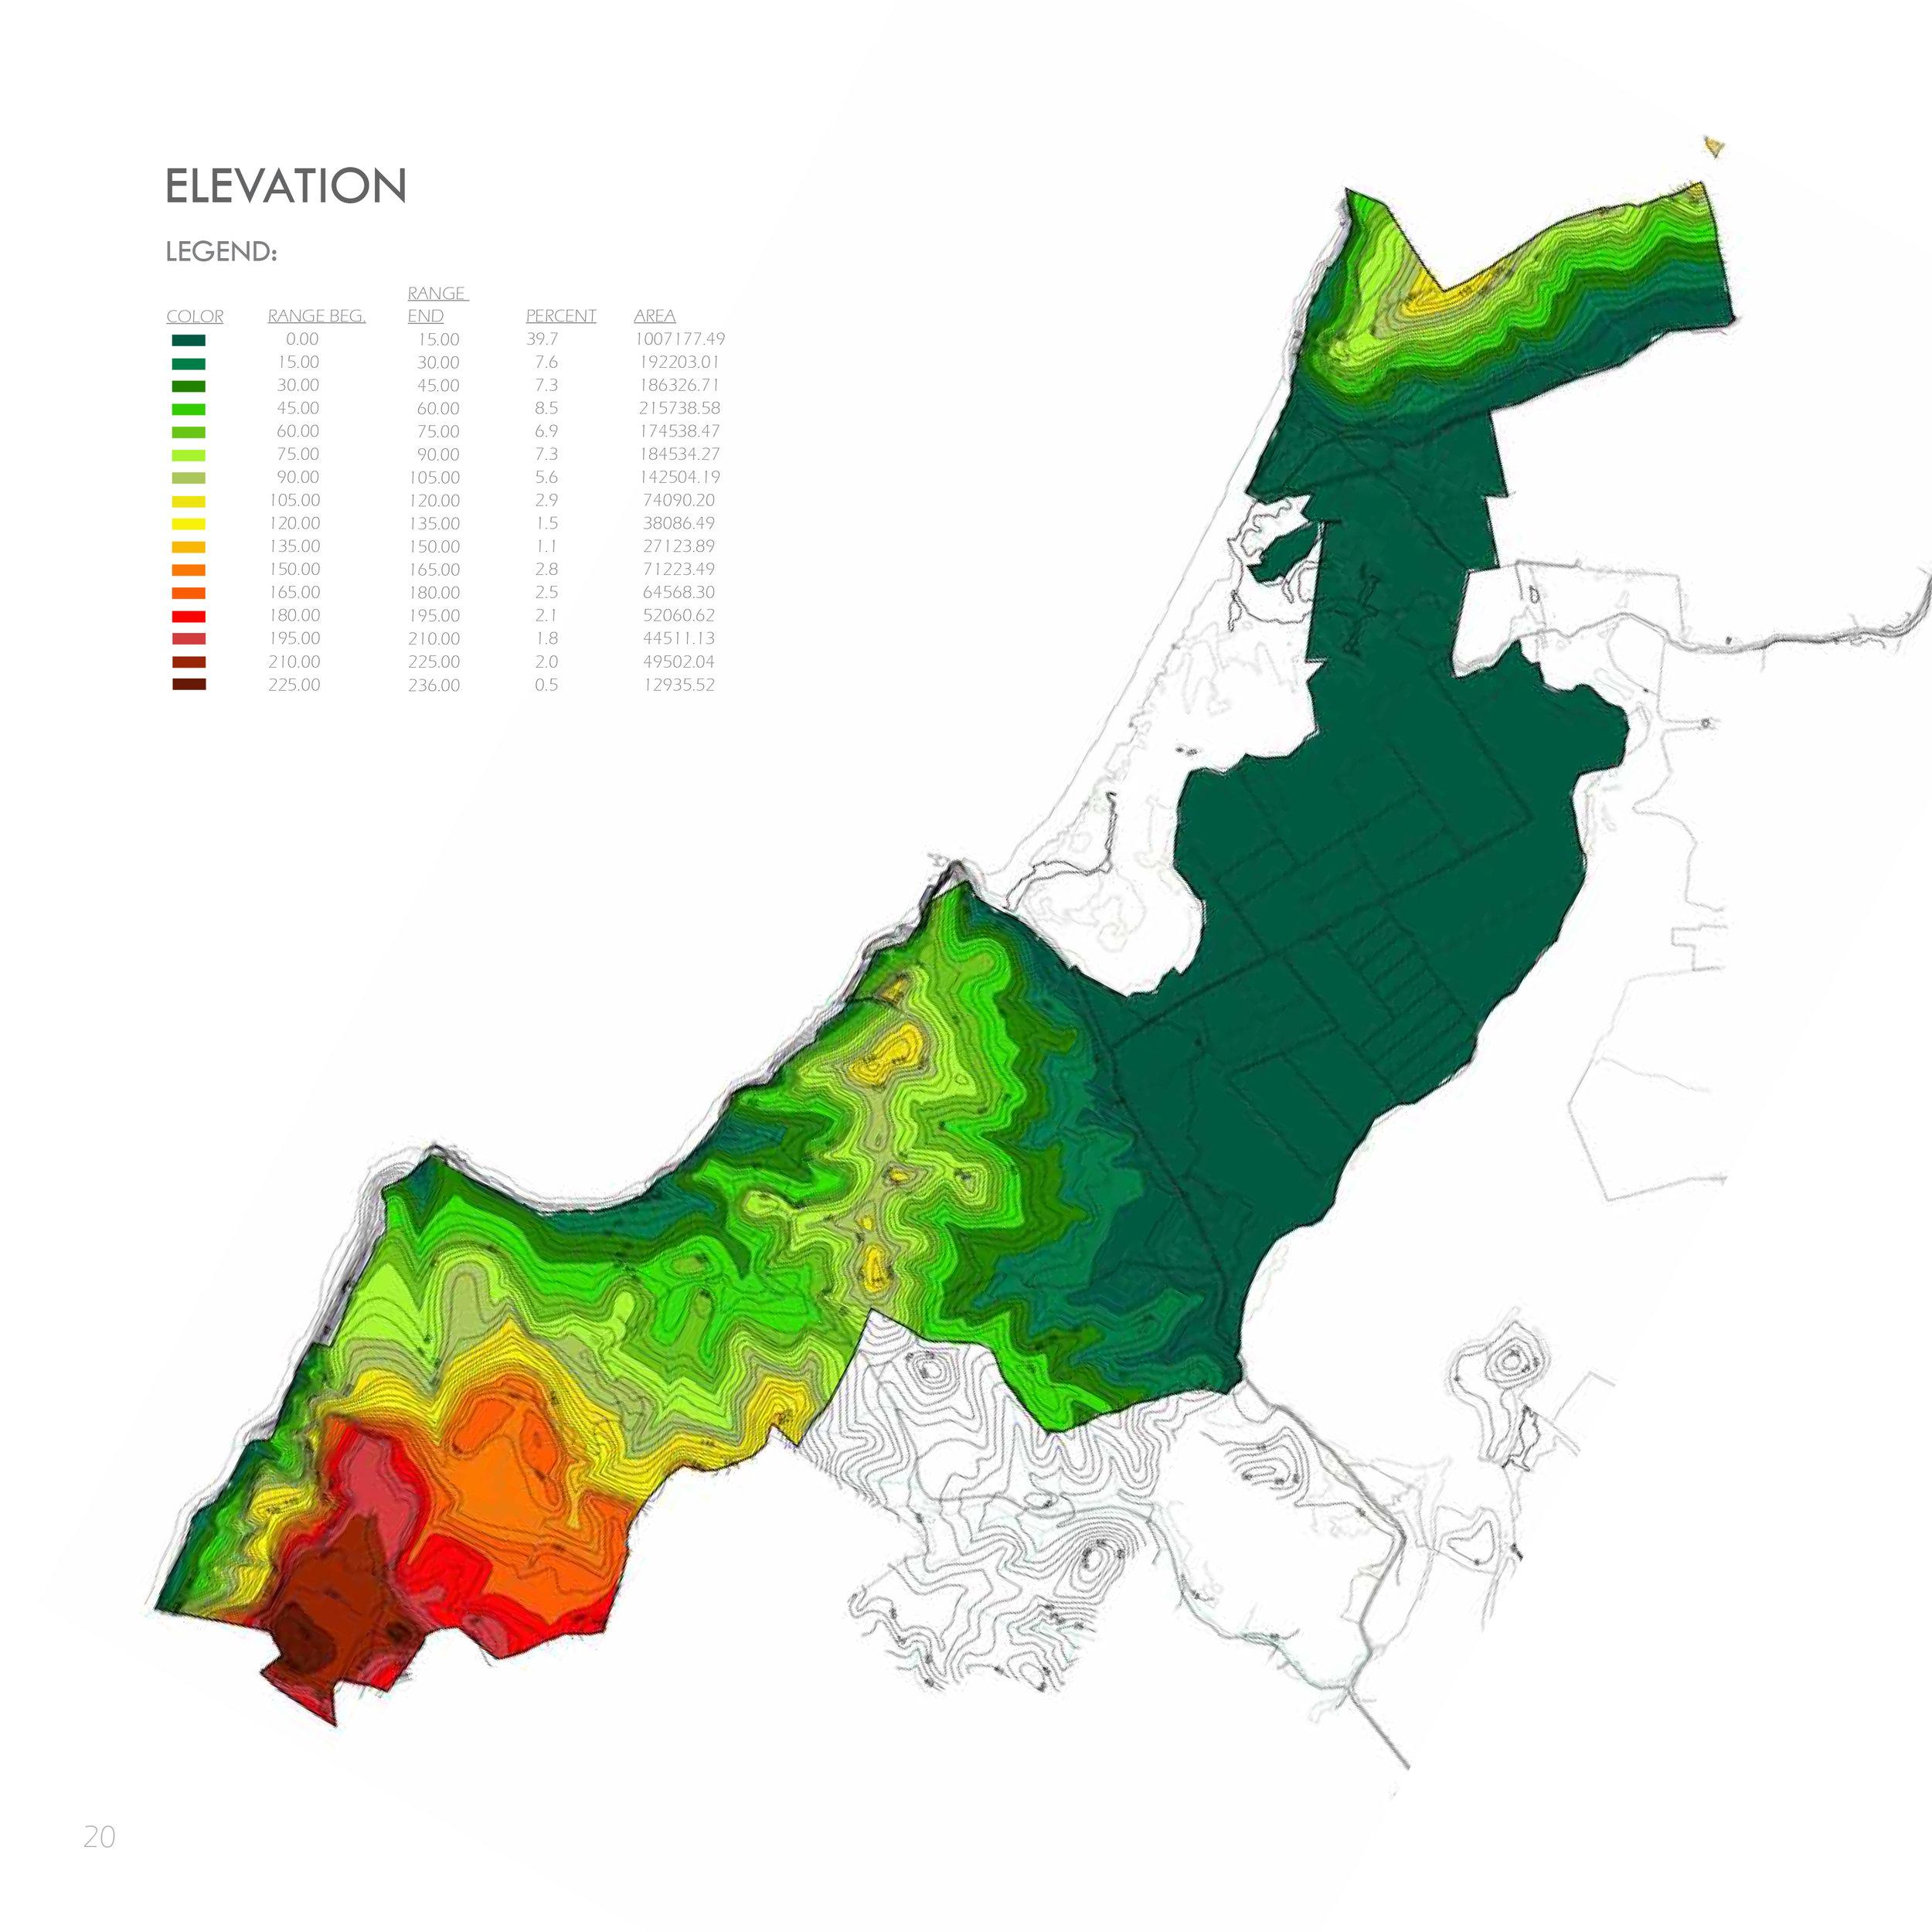 topography analysis - elevation